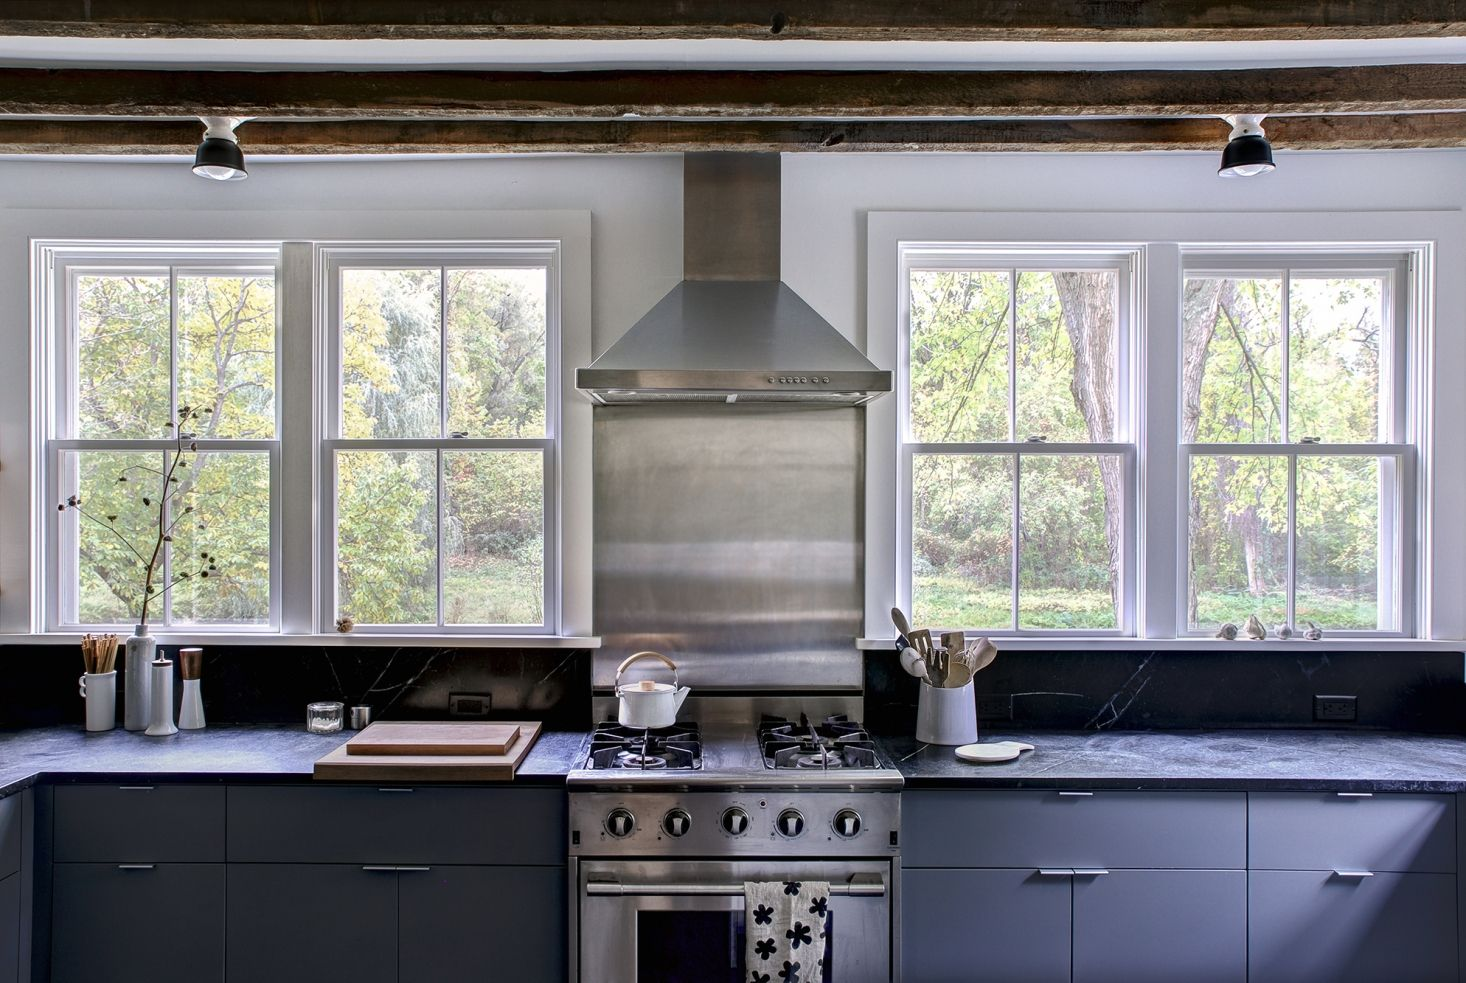 Kitchen Of The Week Hudson Valley Farmhouse Kitchen Reborn Remodelista Kitchen Remodel Farmhouse Kitchen Kitchen Decor